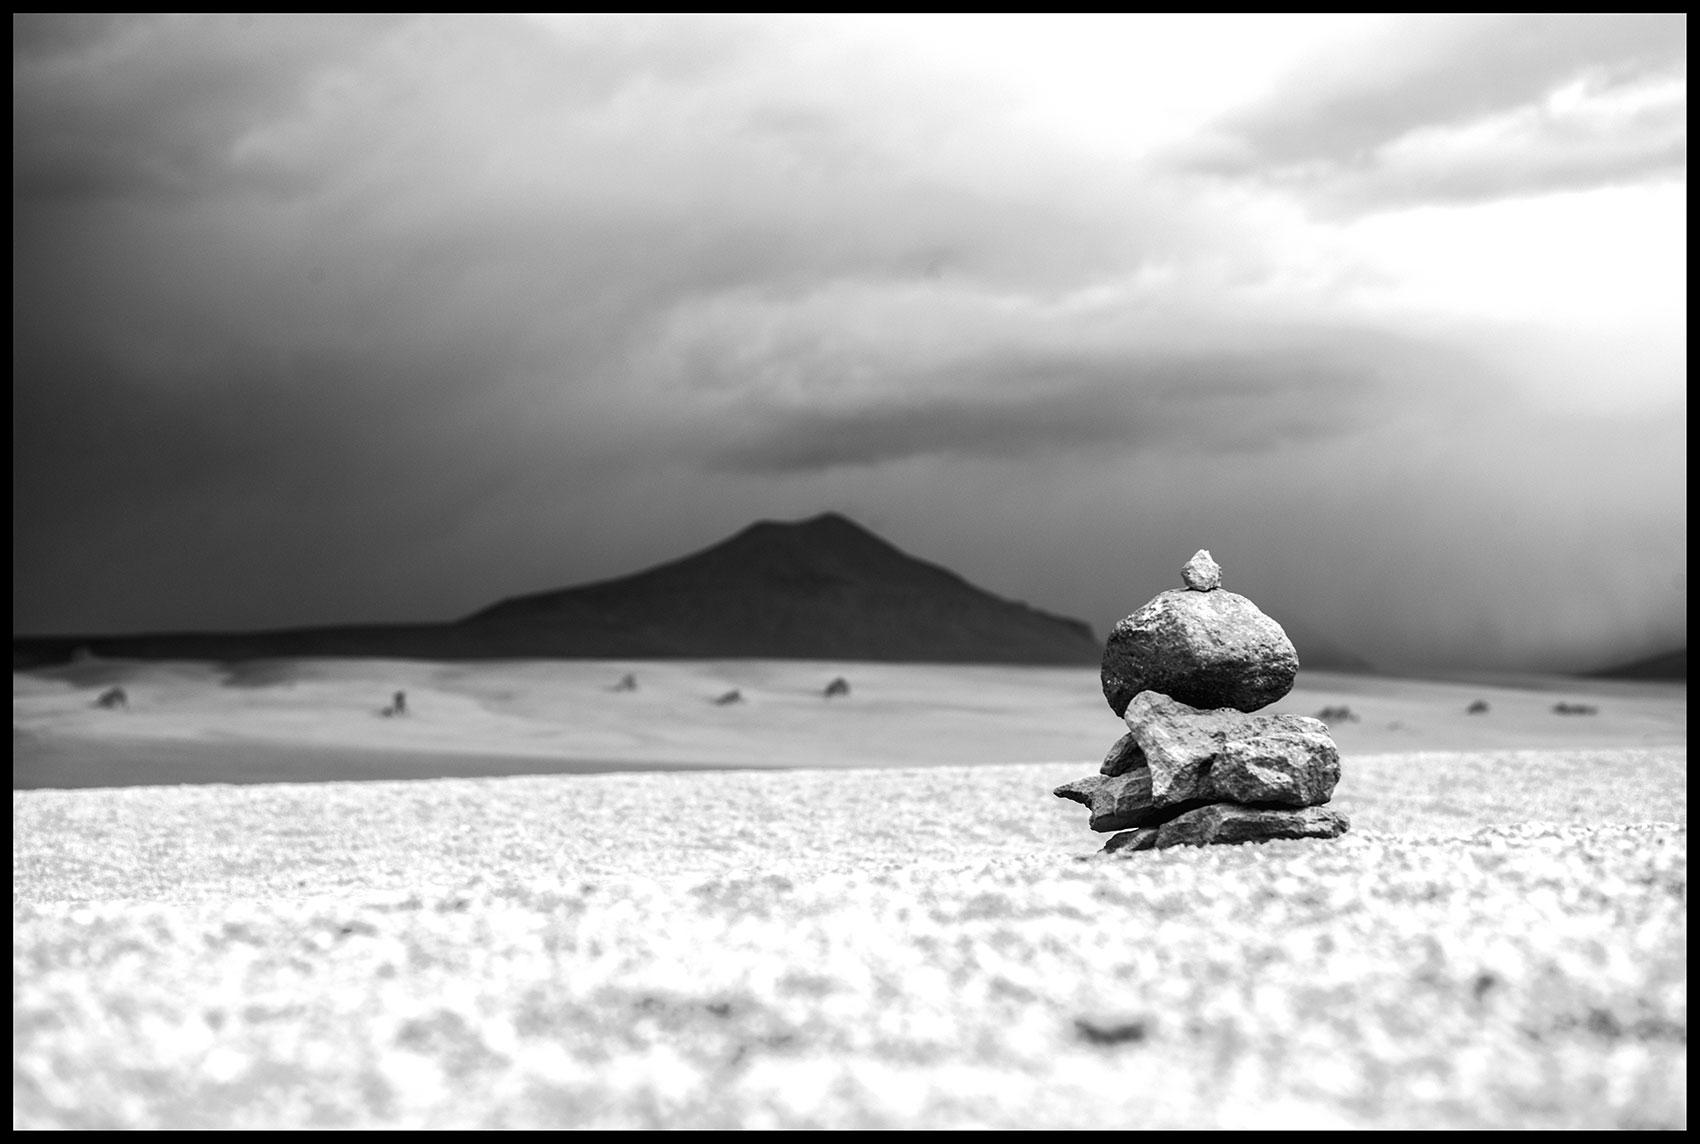 Kkala y Uasara - Before the Storm | Stefano Paradiso - Photographer